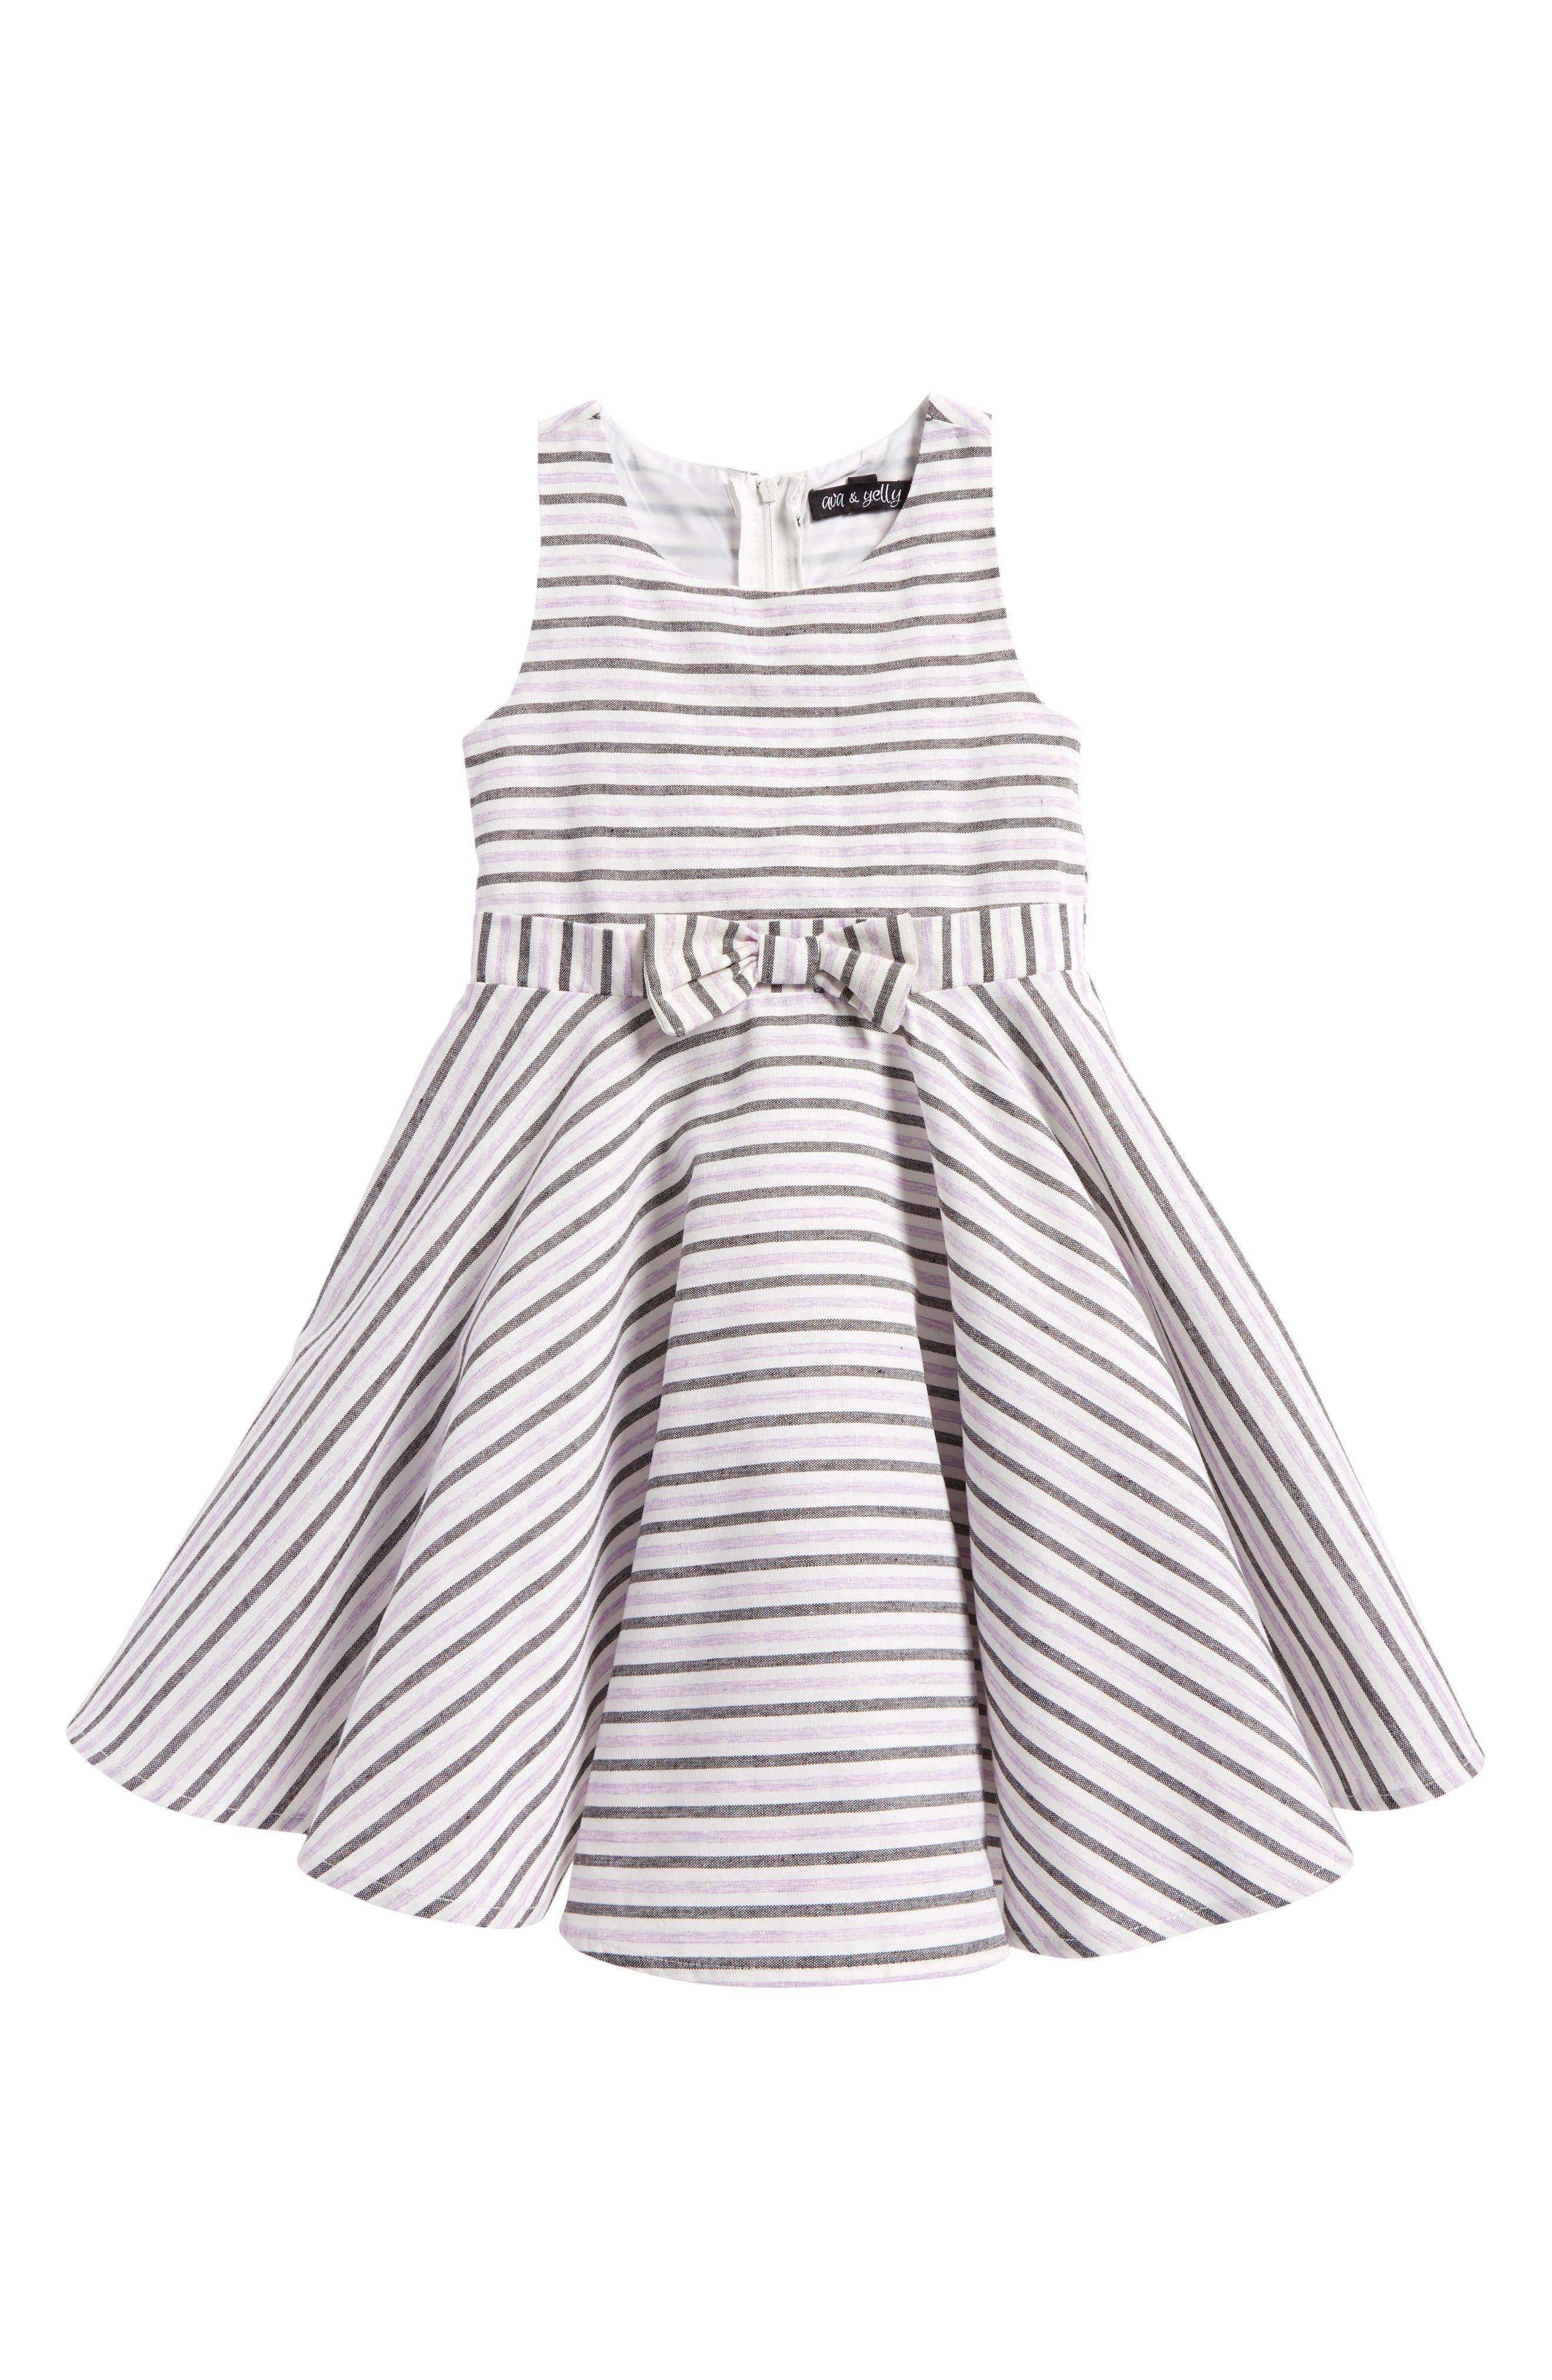 Main Image - Ava & Yelly Stripe Cotton Dress (Toddler Girls & Little Girls)